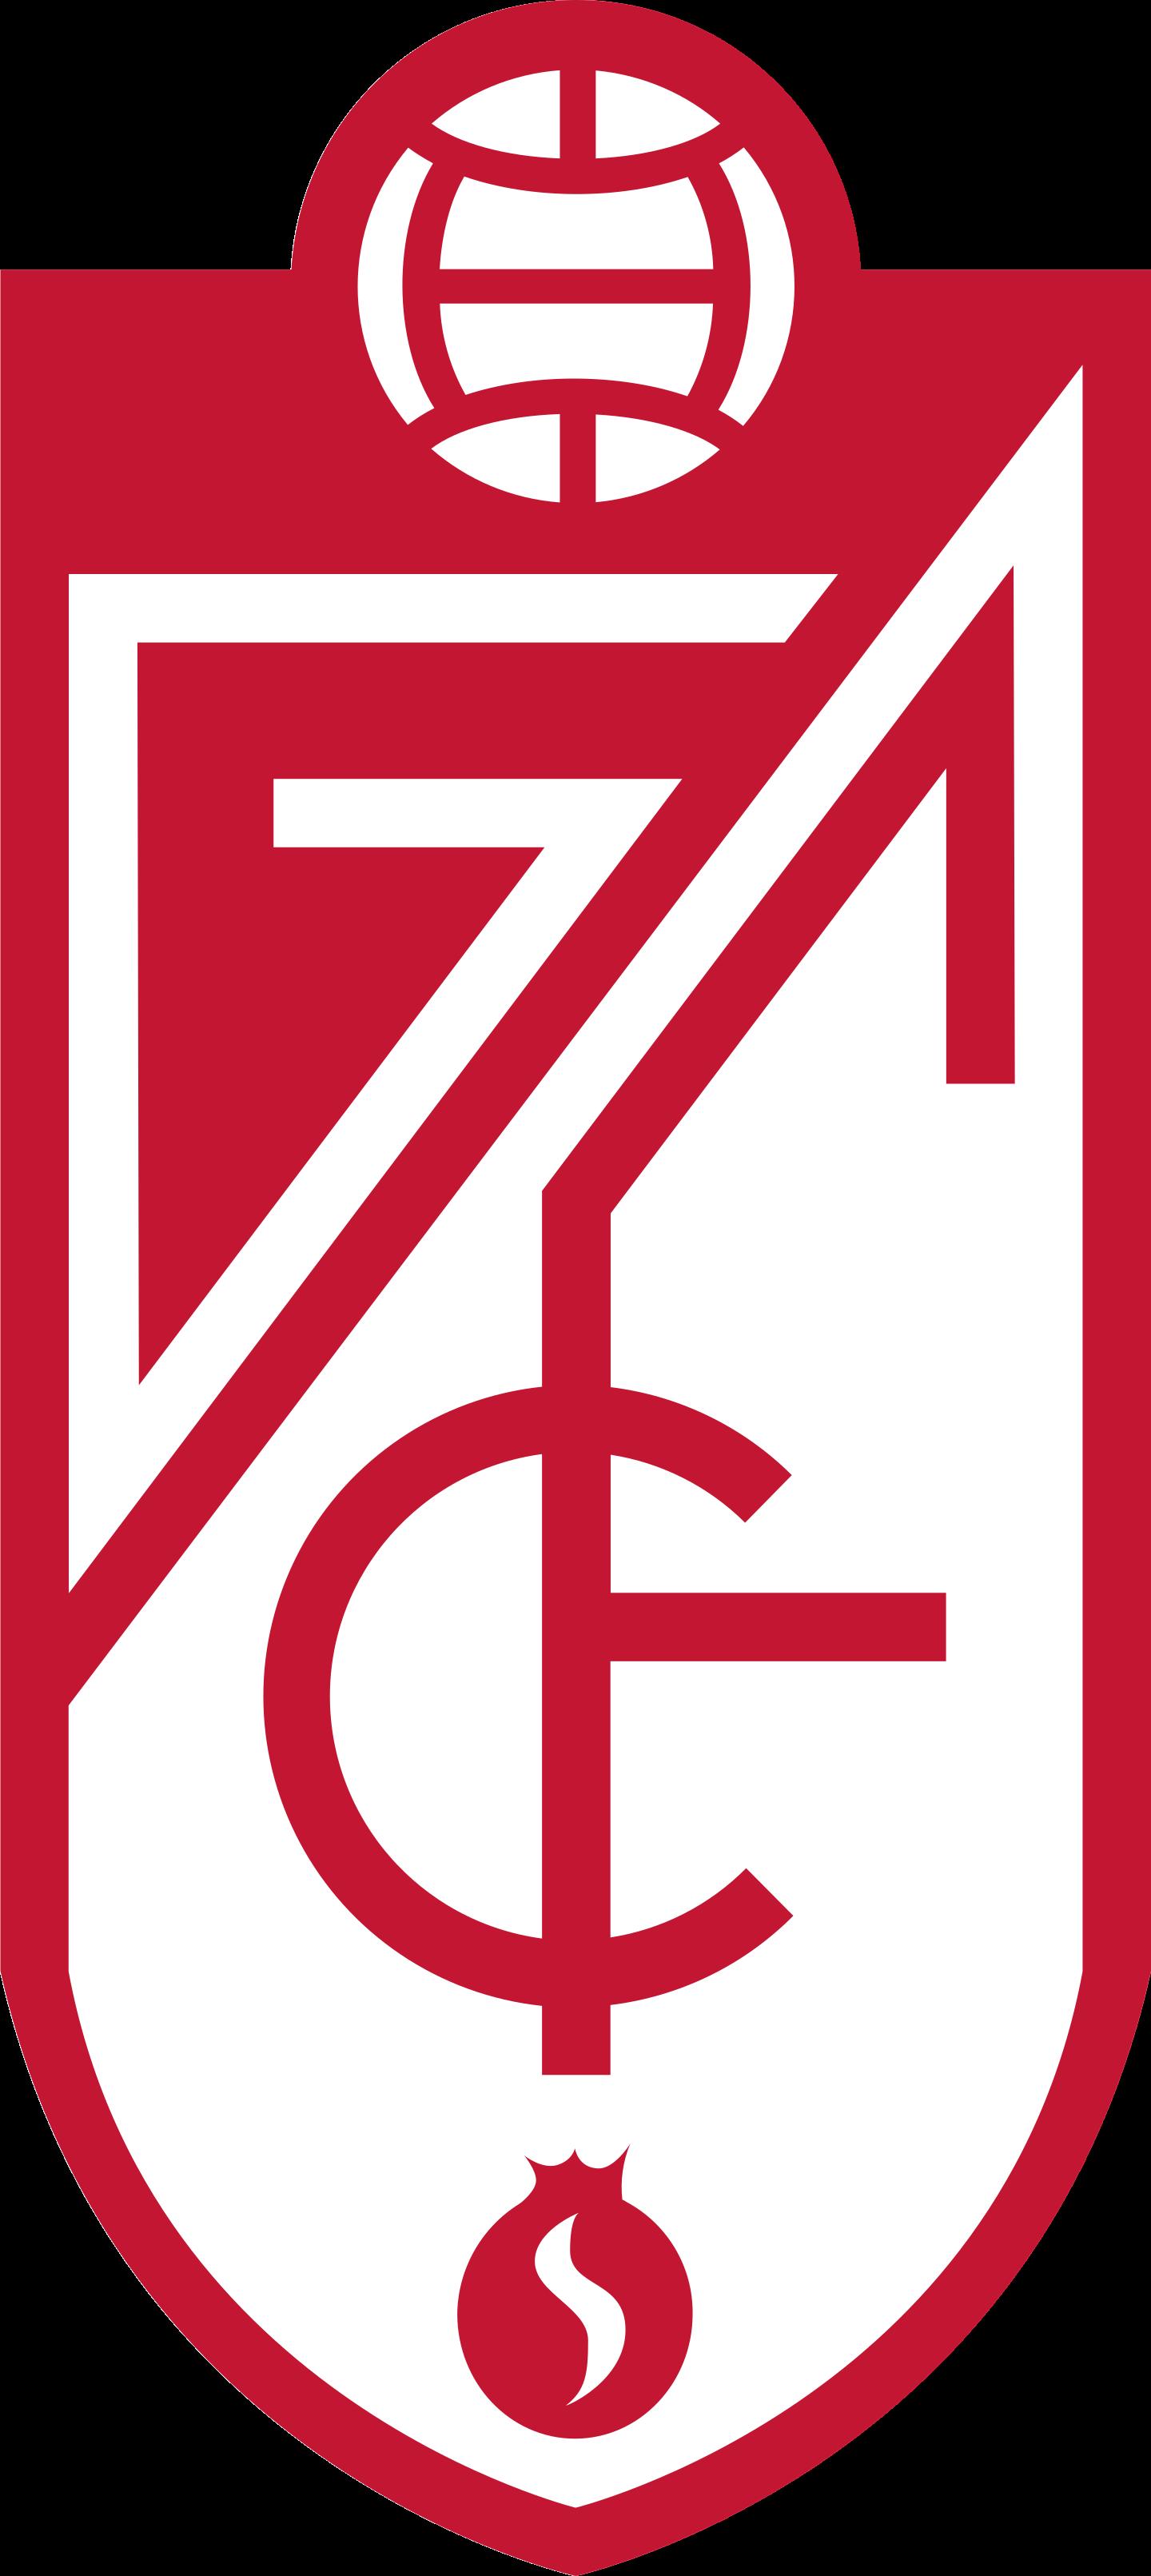 granada fc logo 2 - Granada FC Logo